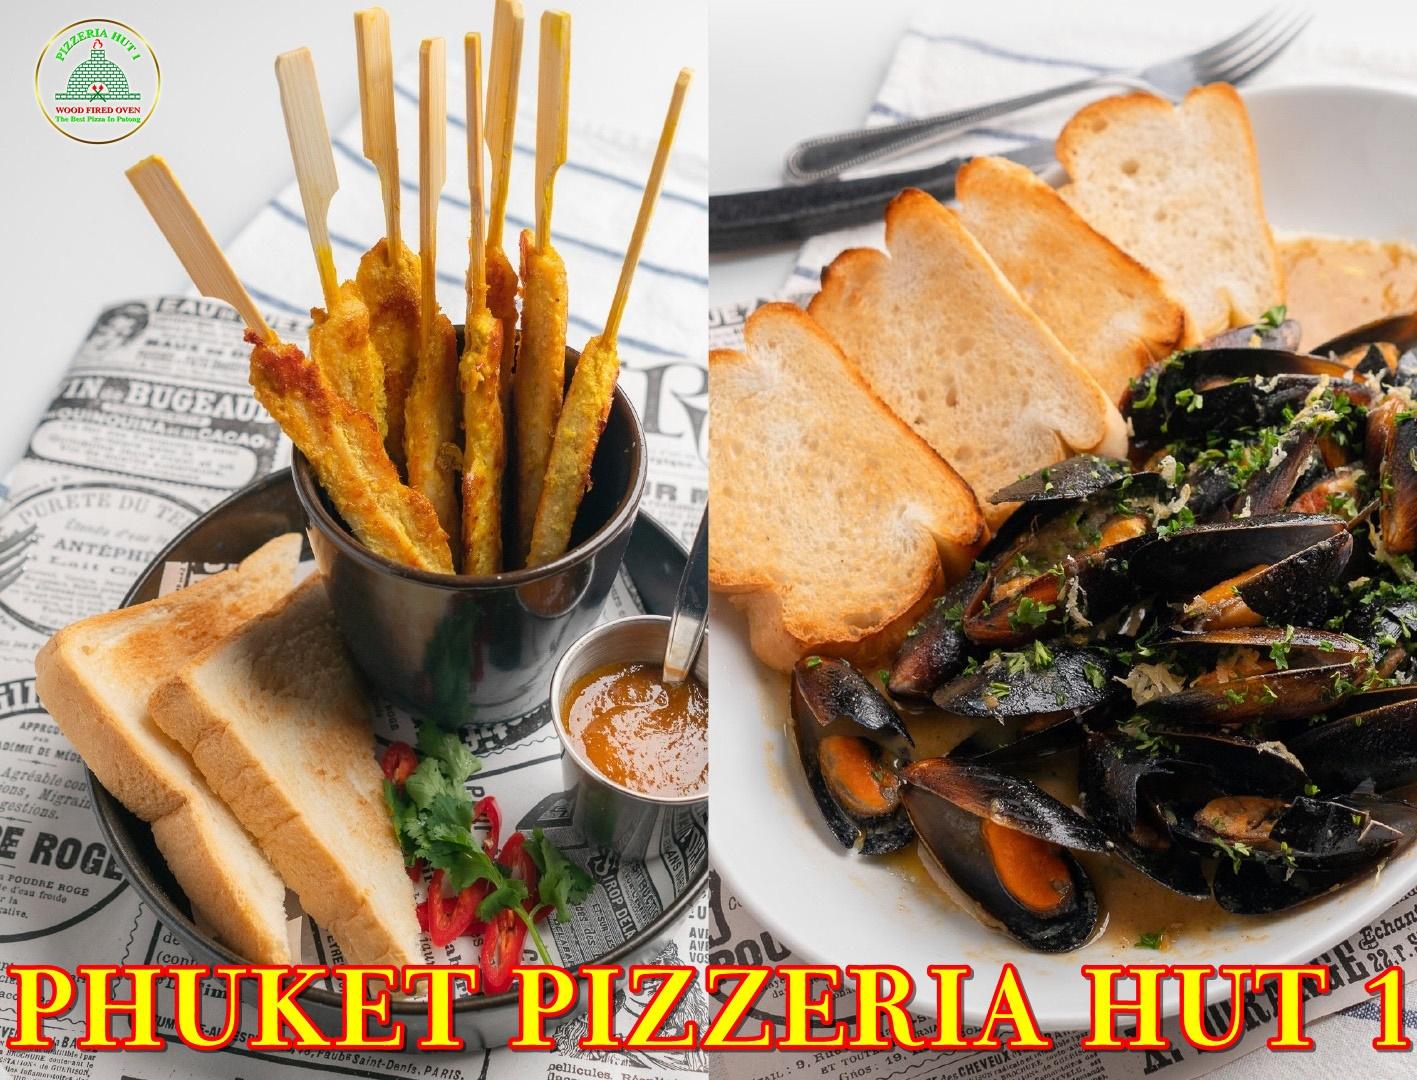 Phuket Pizzeria Hut 1